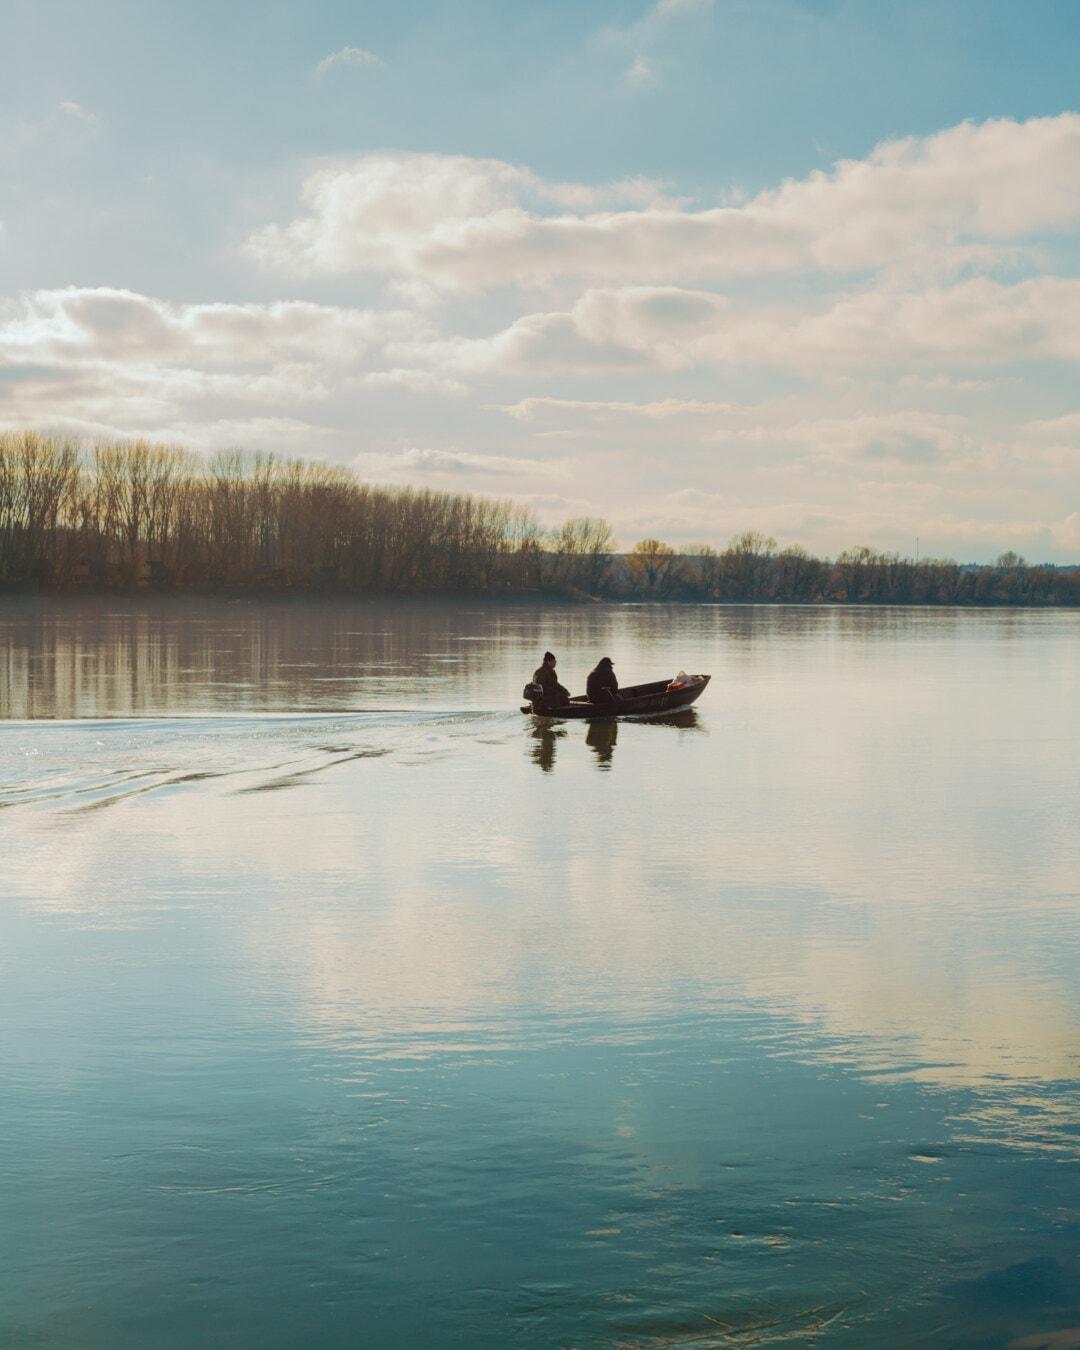 fisherman, fishing boat, morning, foggy, riverbank, river, dawn, reflection, lake, sunset